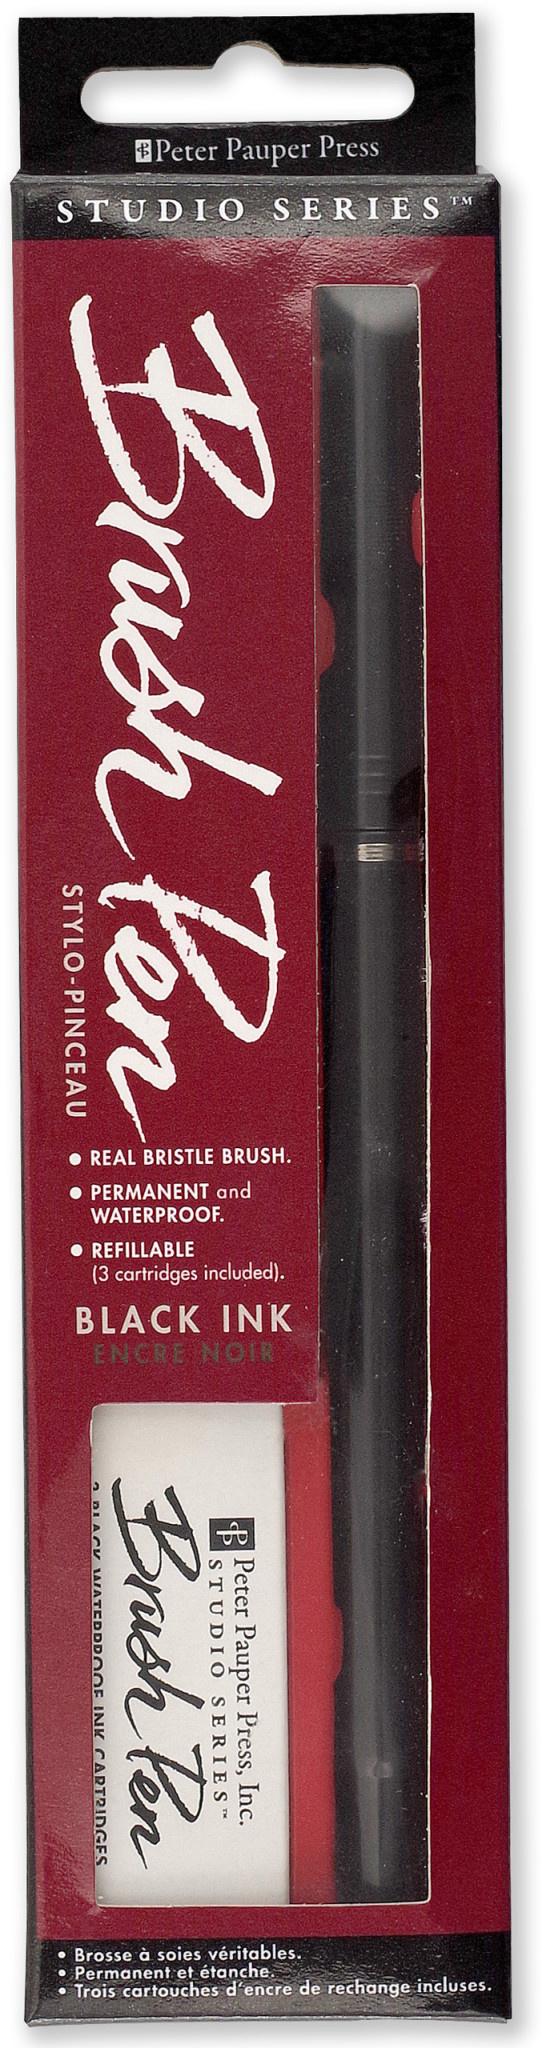 Studio Series Brush Pen